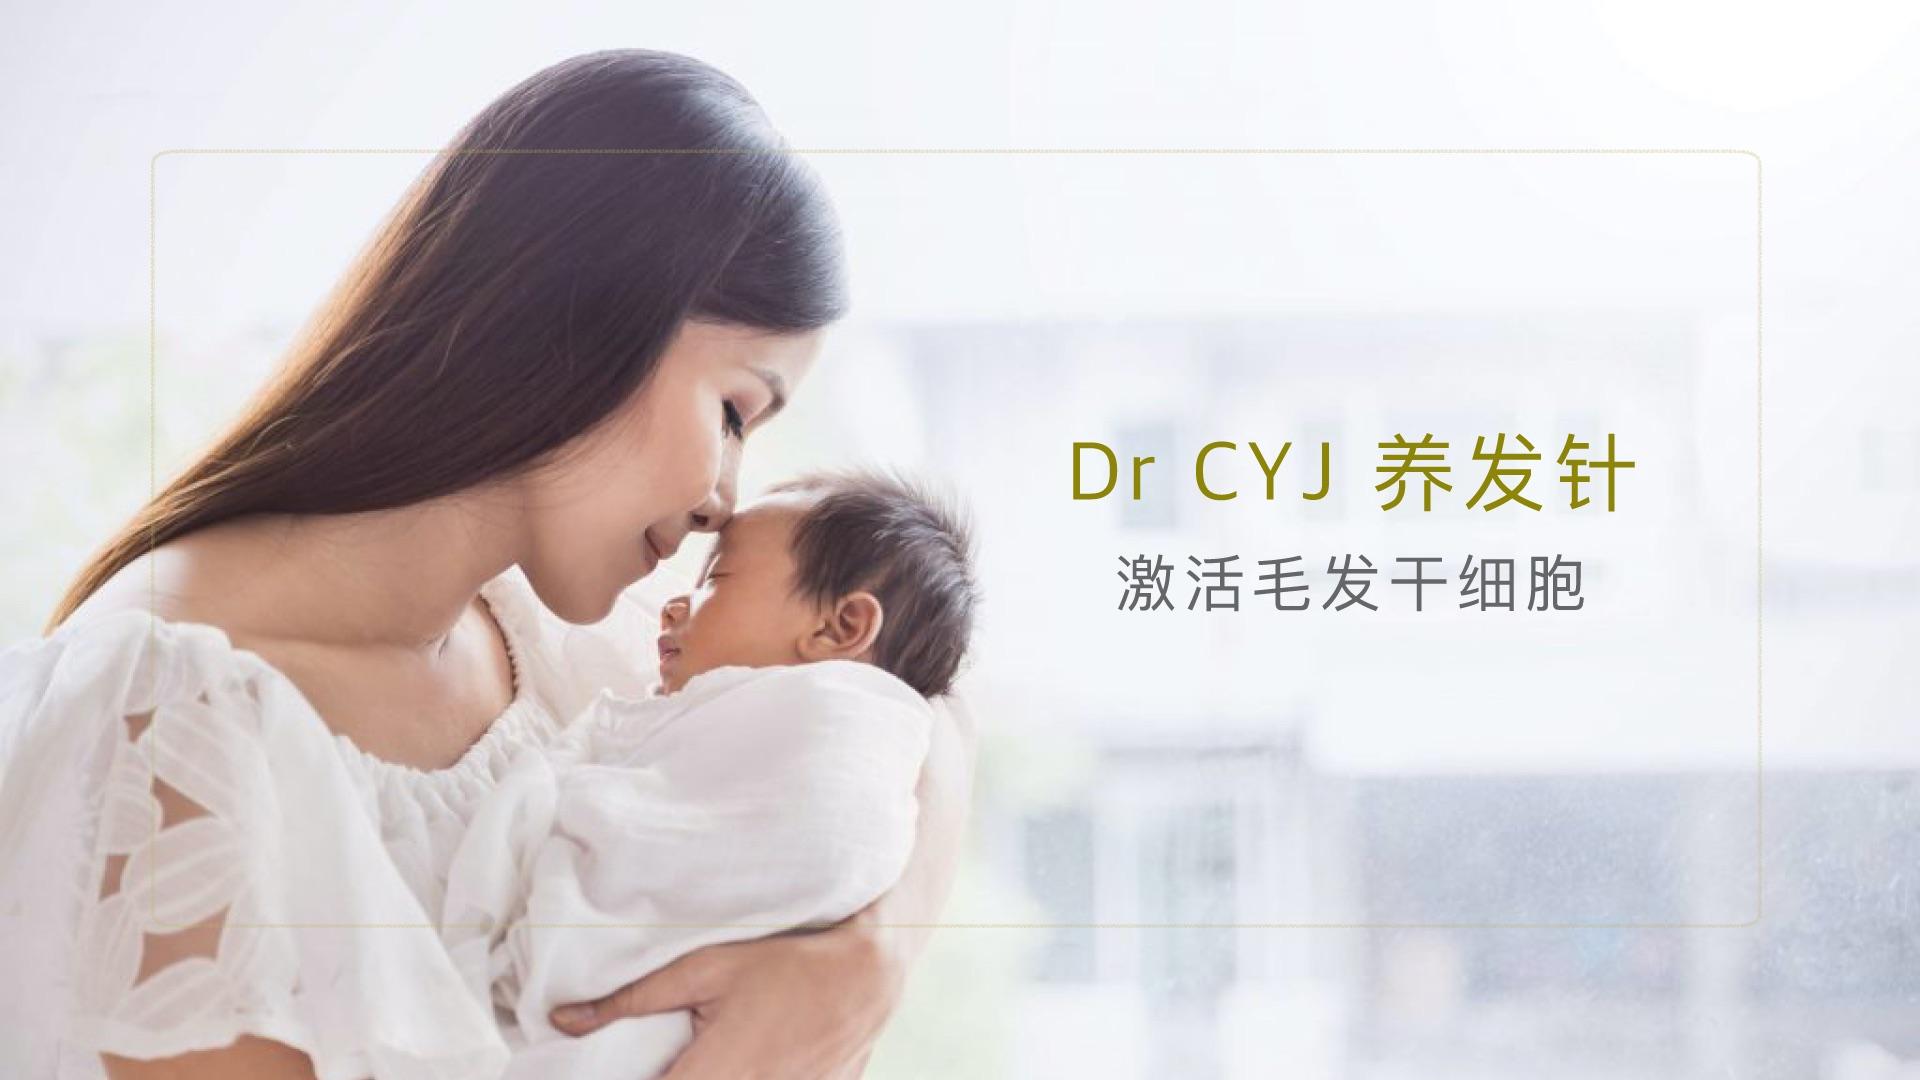 DR CYJ 养发针